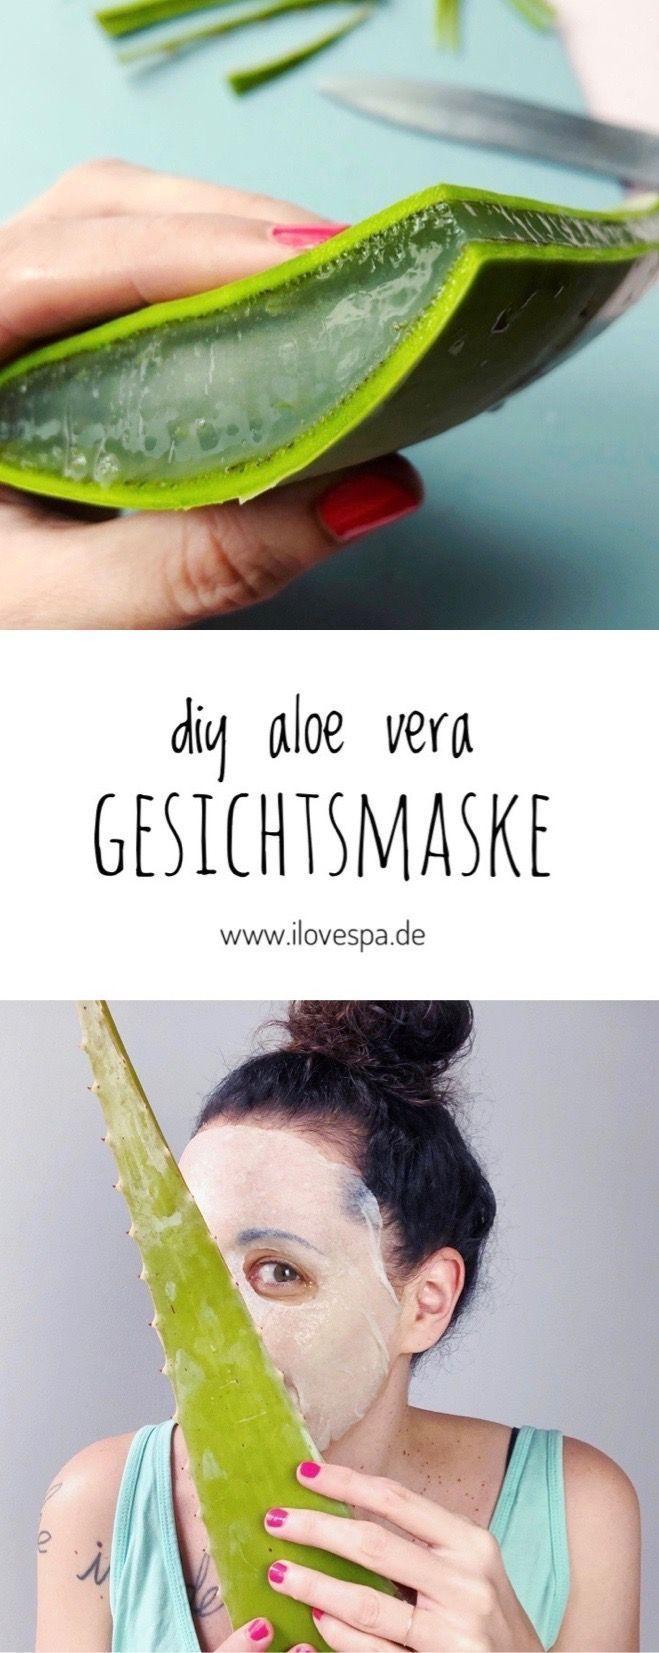 Aloe Vera Gesichtsmaske DIY – Aloe Vera Maske selber machen – #Aloe #DIY #Gesich… d58dff01f0c341cb3443787fd0030686